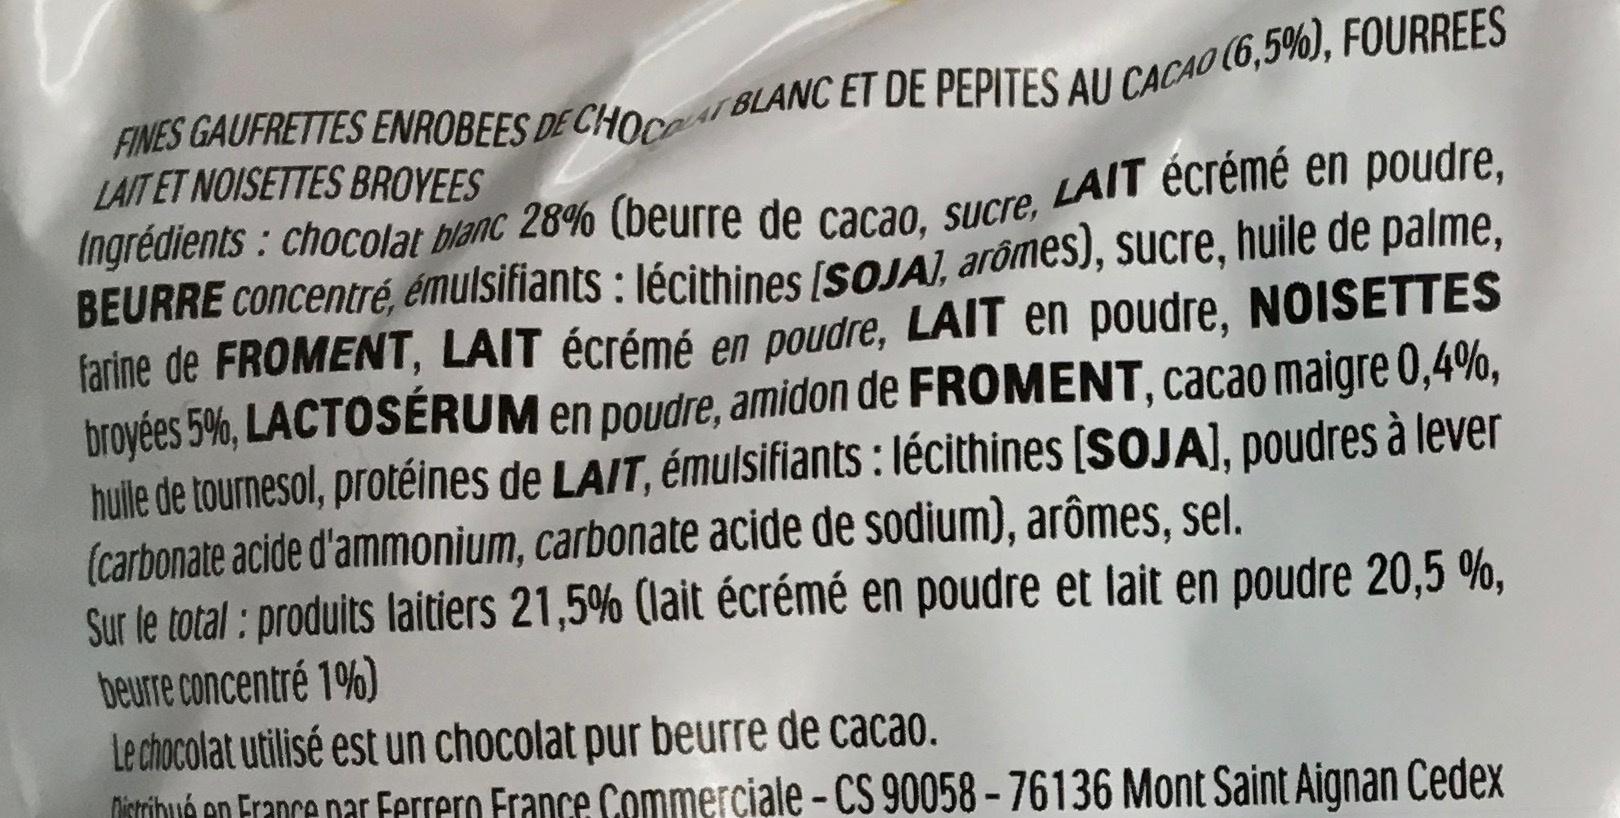 Kinder bueno white gaufrettes enrobees de chocolat blanc 2 x 2 barres - Ingredienti - fr